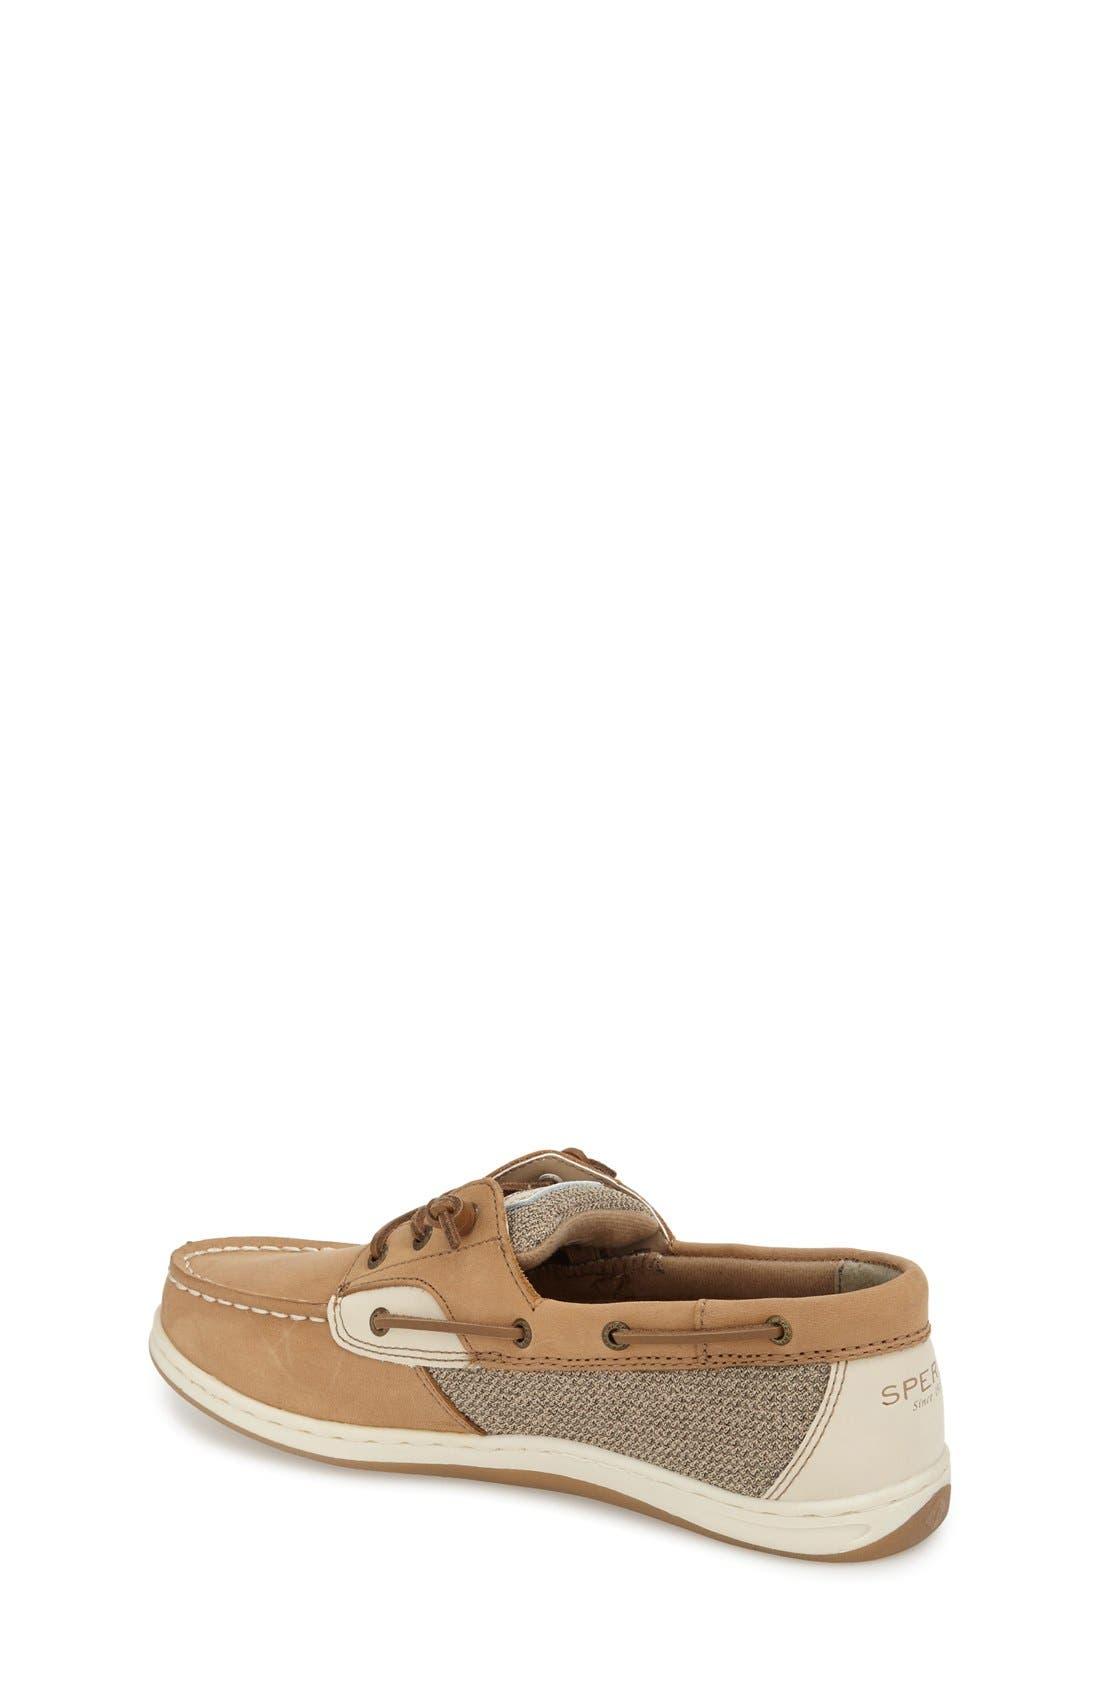 'Songfish' Boat Shoe,                             Alternate thumbnail 2, color,                             Linen/ Oat Leather